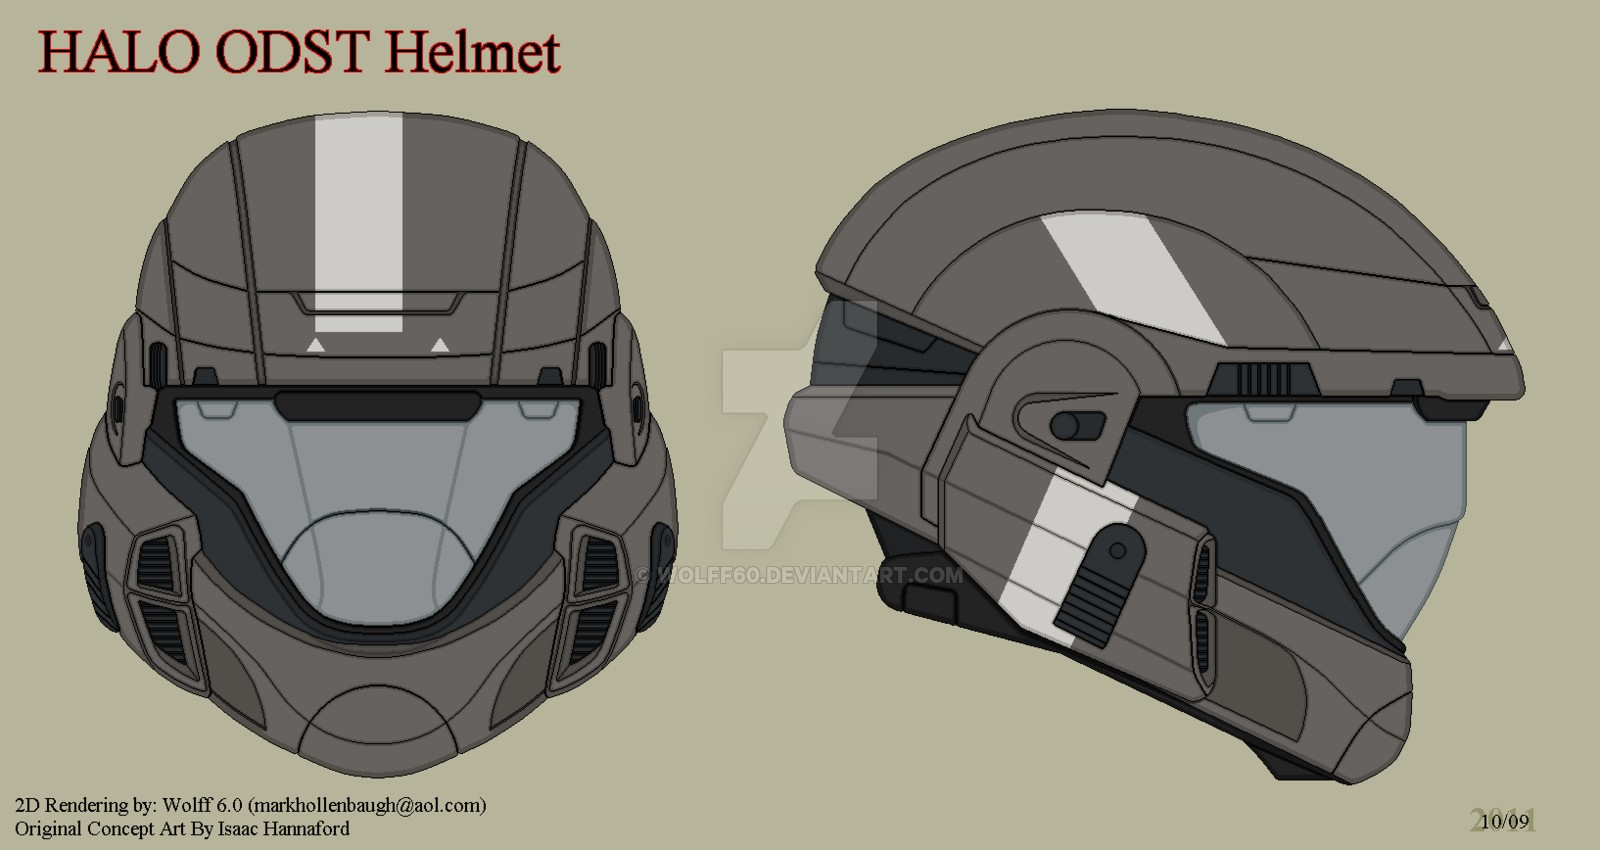 Halo Papercraft Helmet Halo Odst Helmet by Wolff60viantart On Deviantart